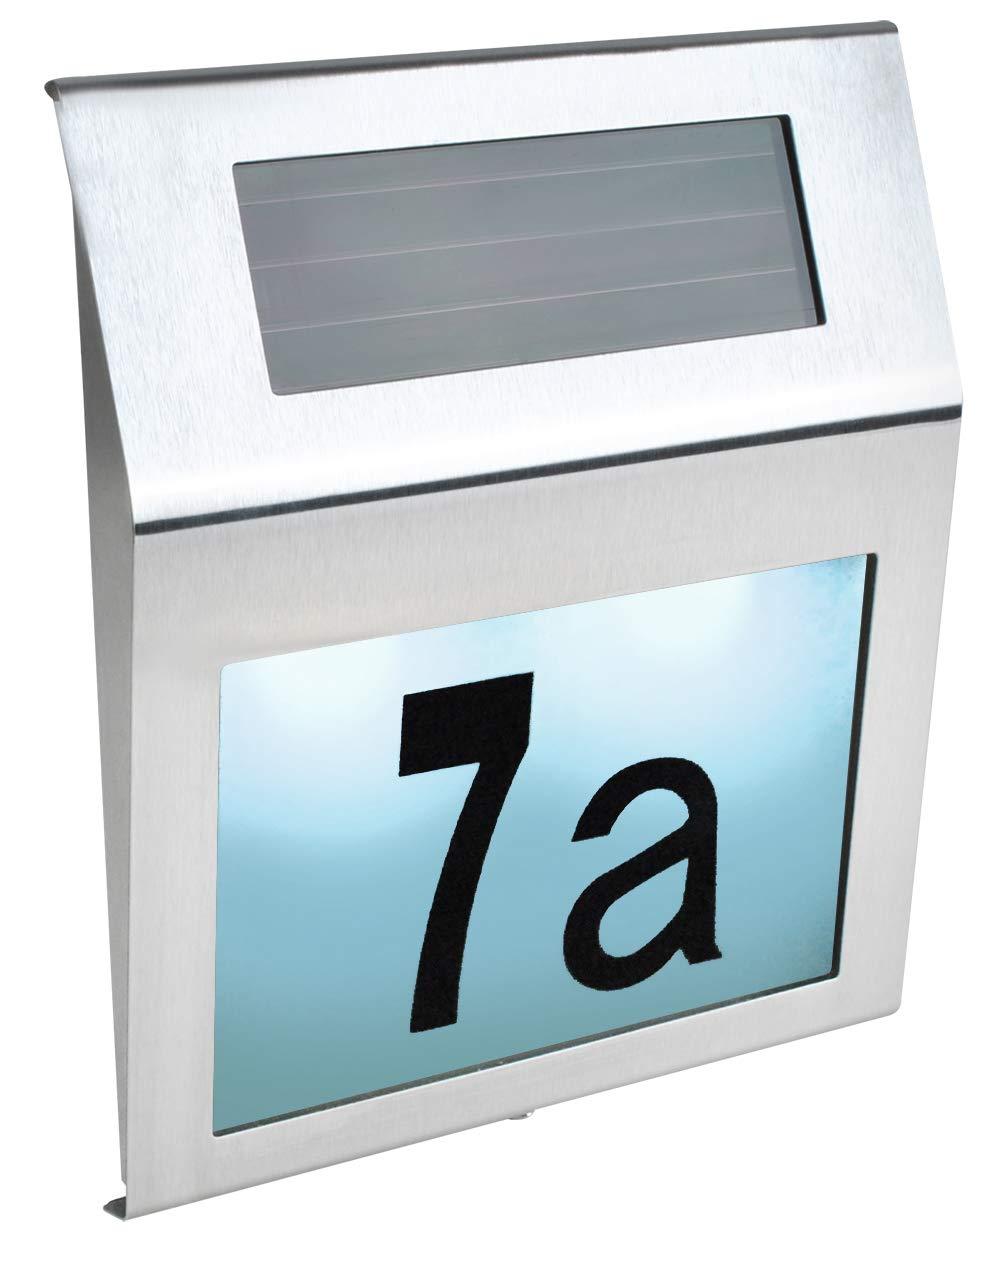 Iso Trade Solar Hausnummer LED Zahlen Buchstaben Akku D/ämmerungssensor Montagematerial 6783